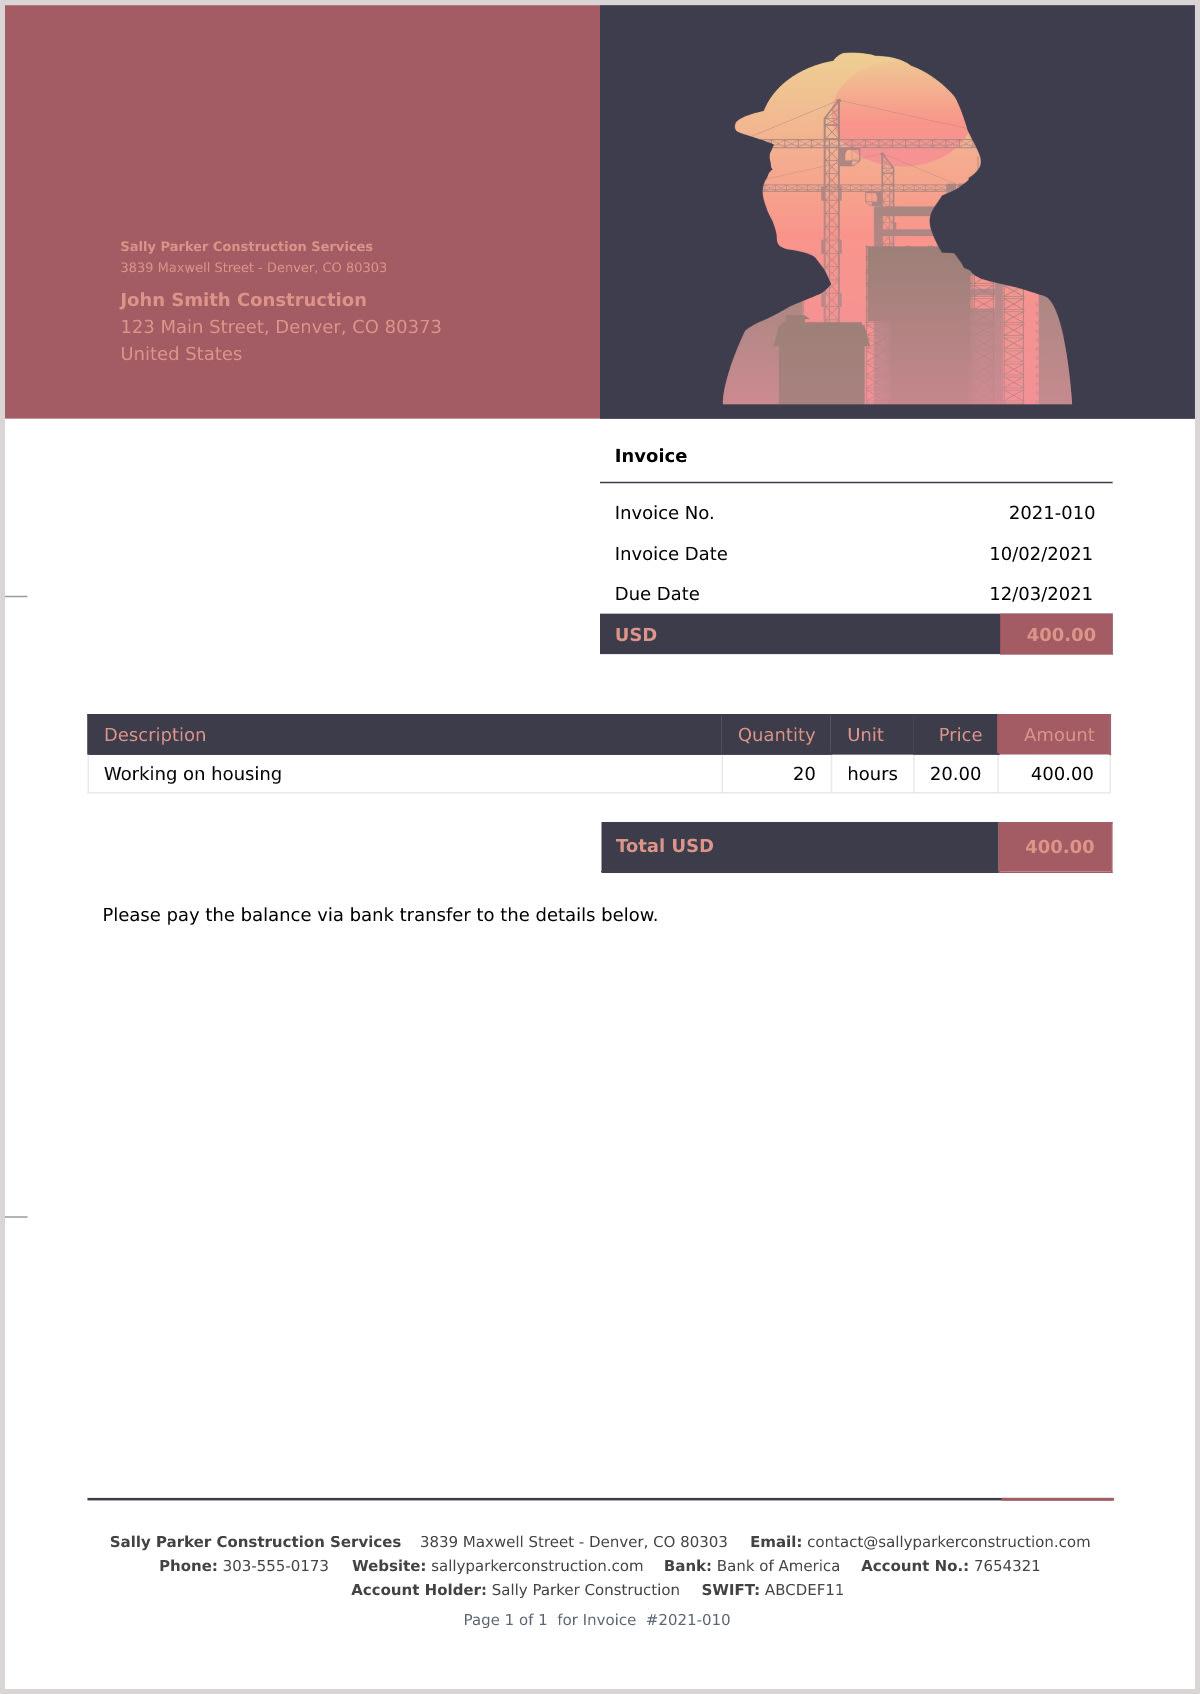 Sample construction invoice